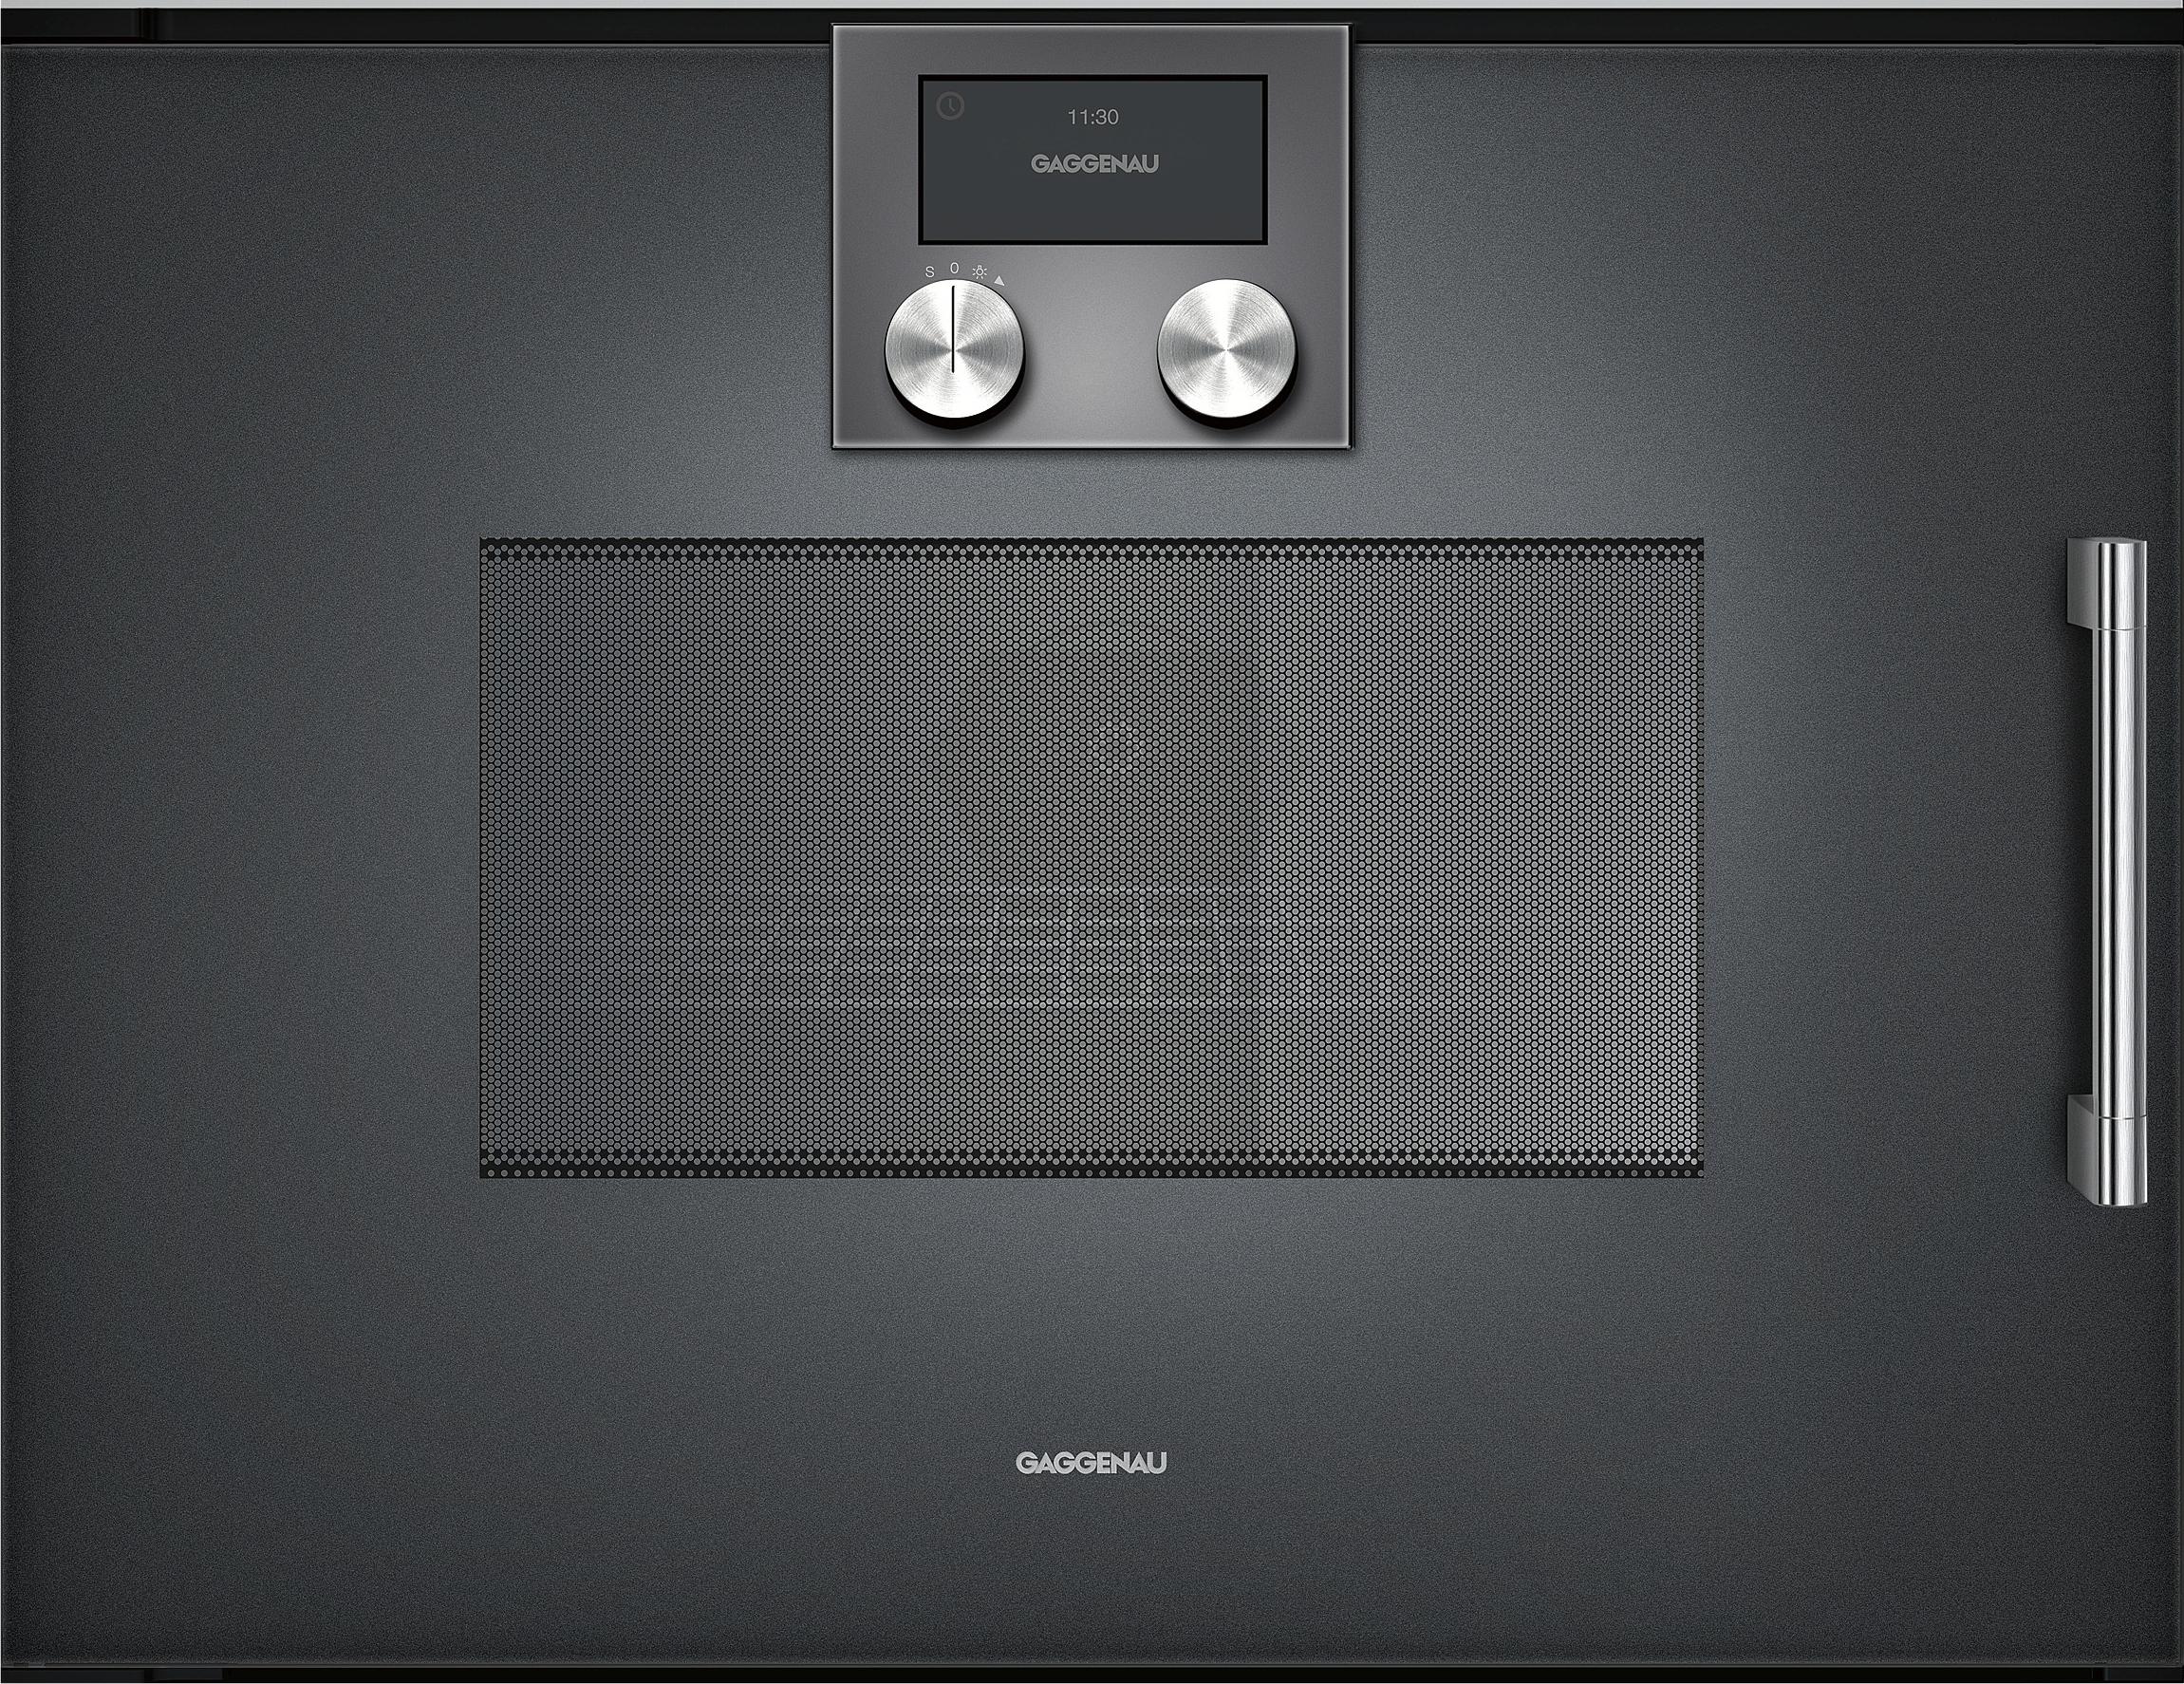 gaggenau bmp251100 mikrowellen backofen serie 200 vollglast r in gaggenau anthrazit breite 60 cm. Black Bedroom Furniture Sets. Home Design Ideas